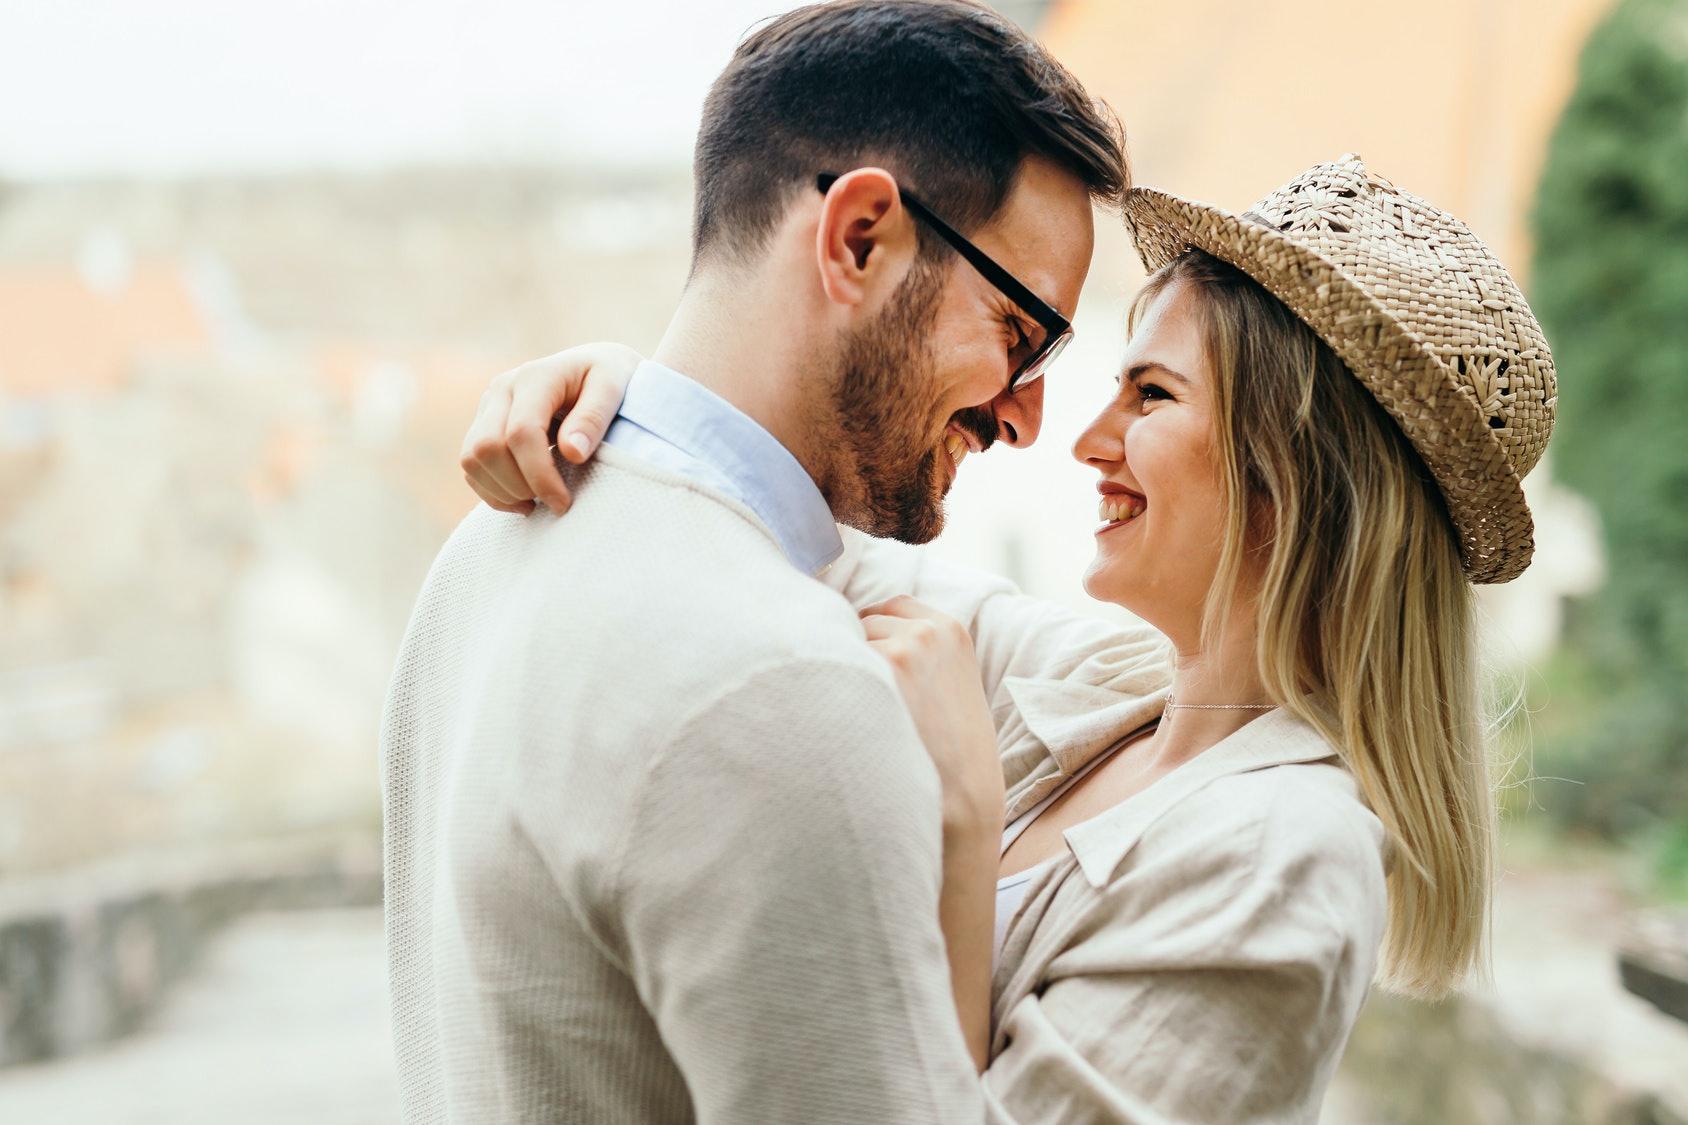 Isfj male dating profile